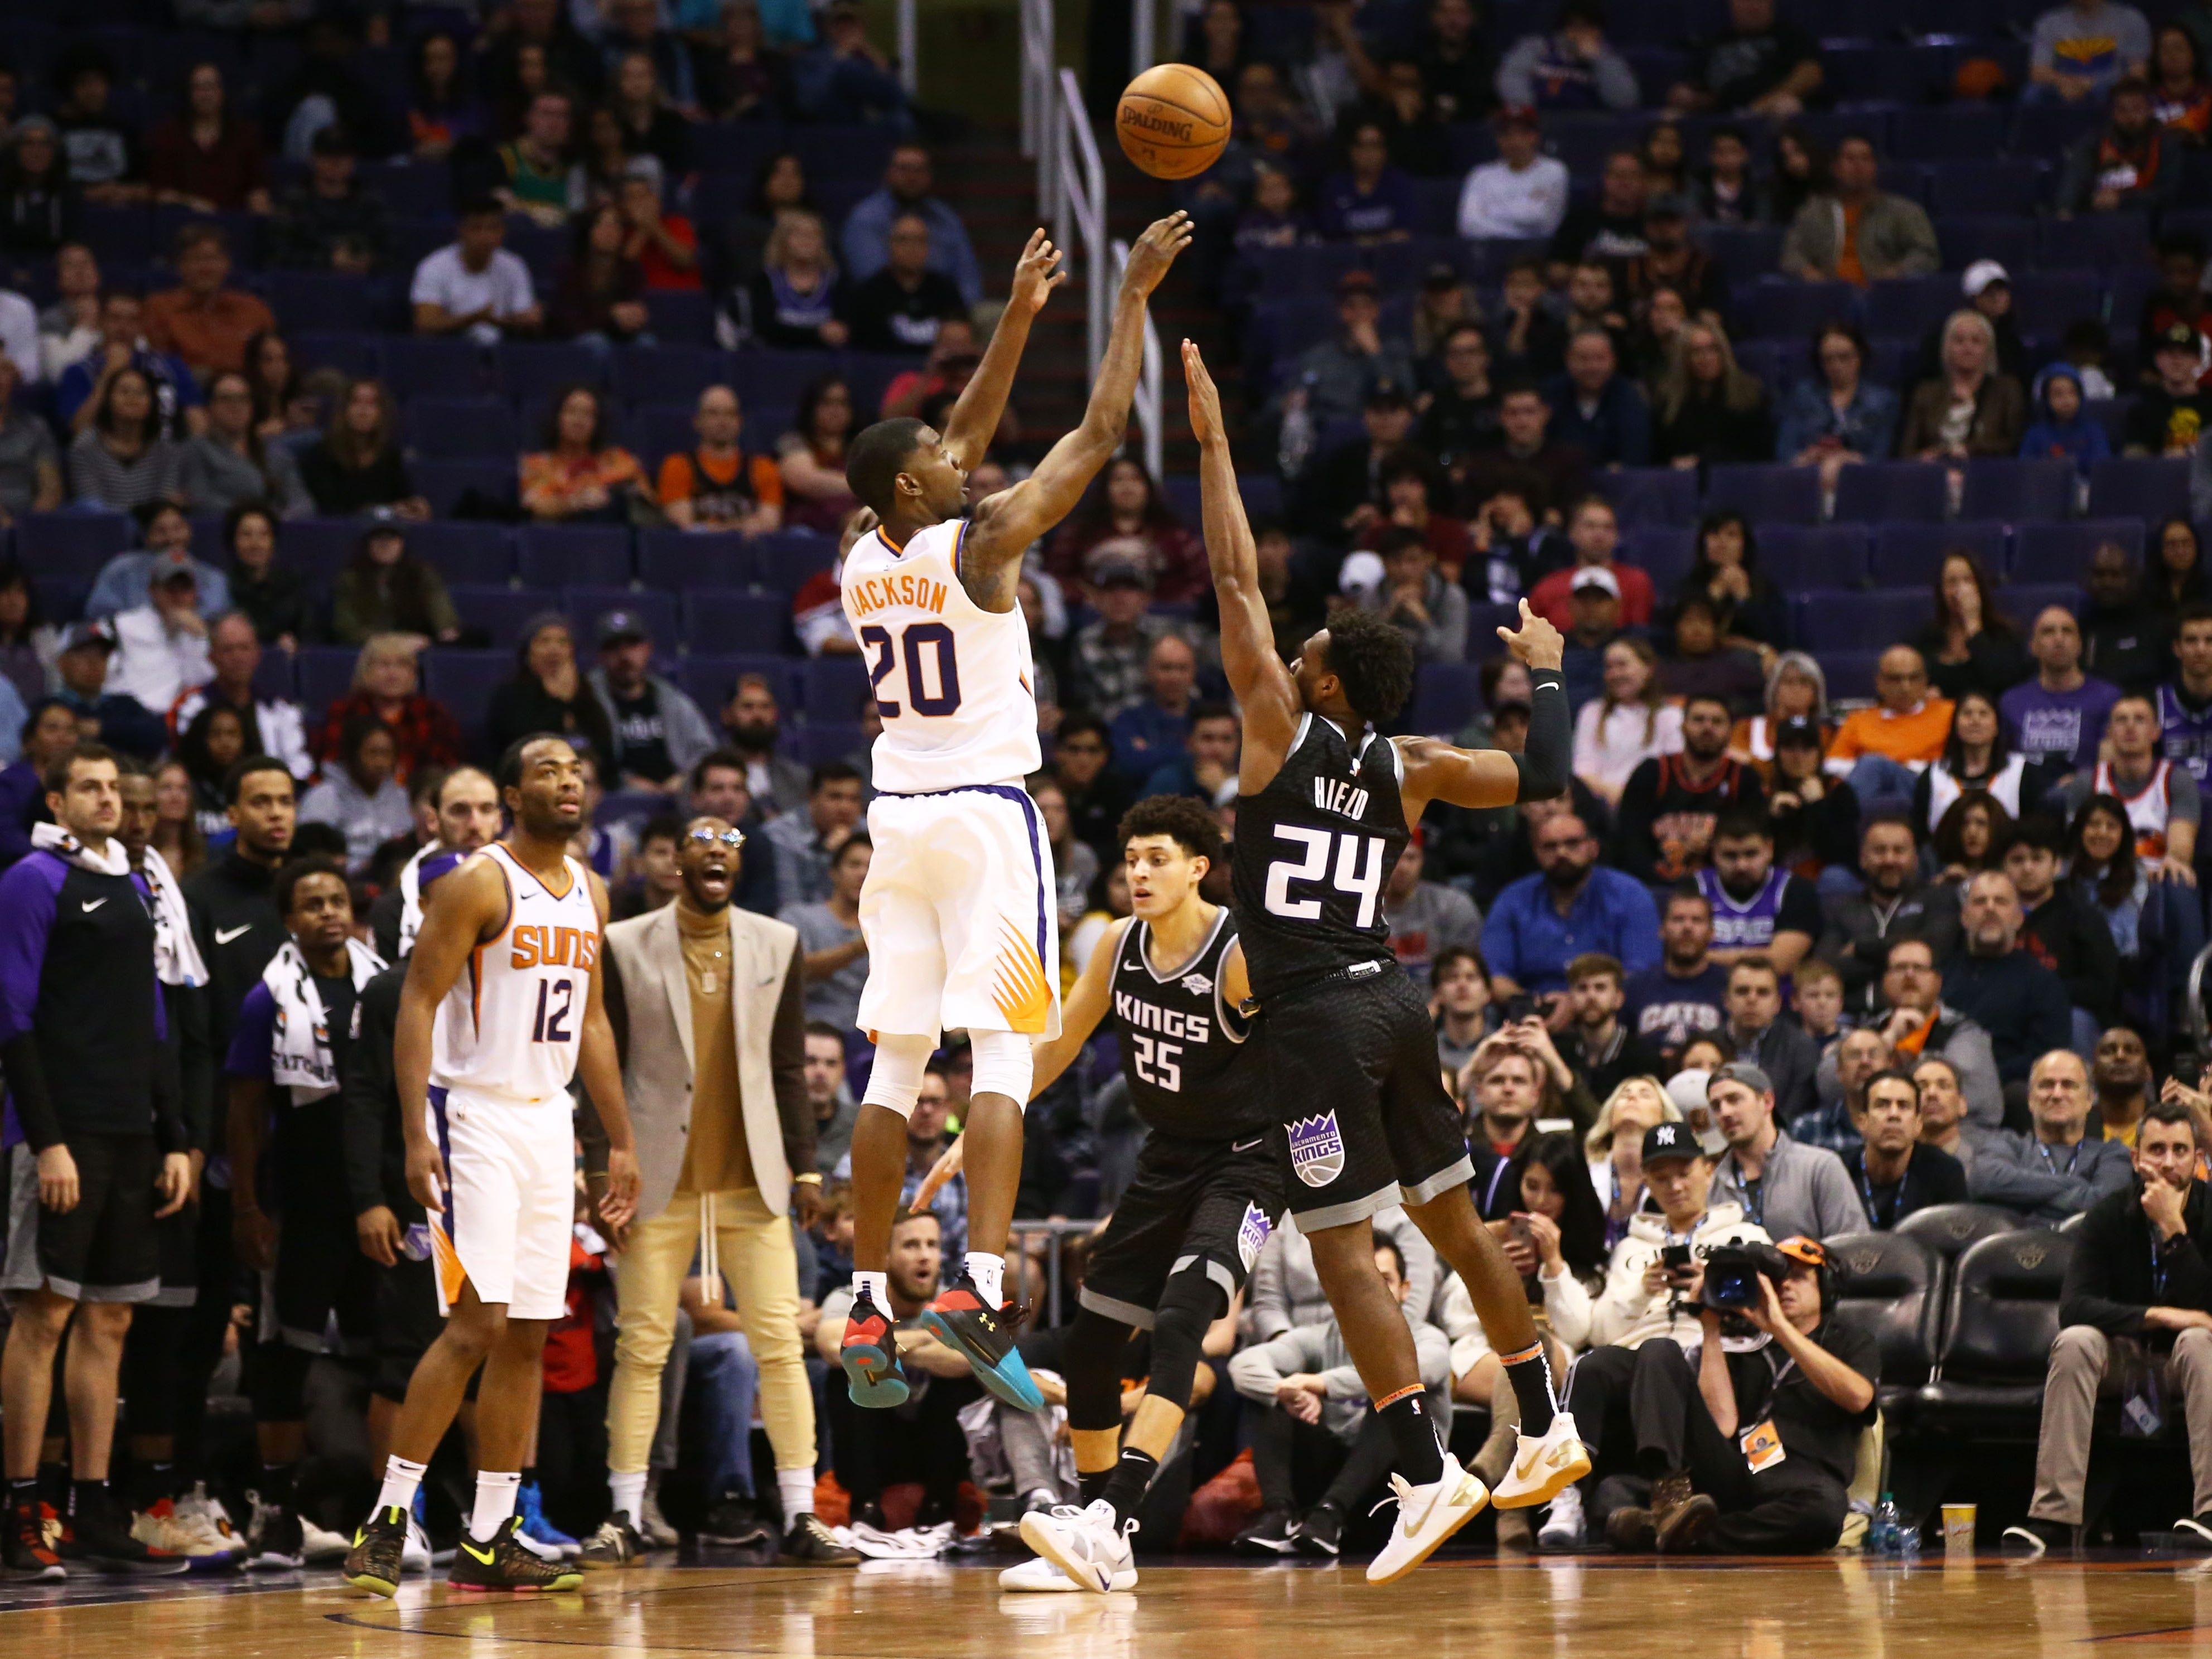 Phoenix Suns forward Josh Jackson makes a basket against the Sacramento Kings in the second half on Jan. 8 at Talking Stick Resort Arena.